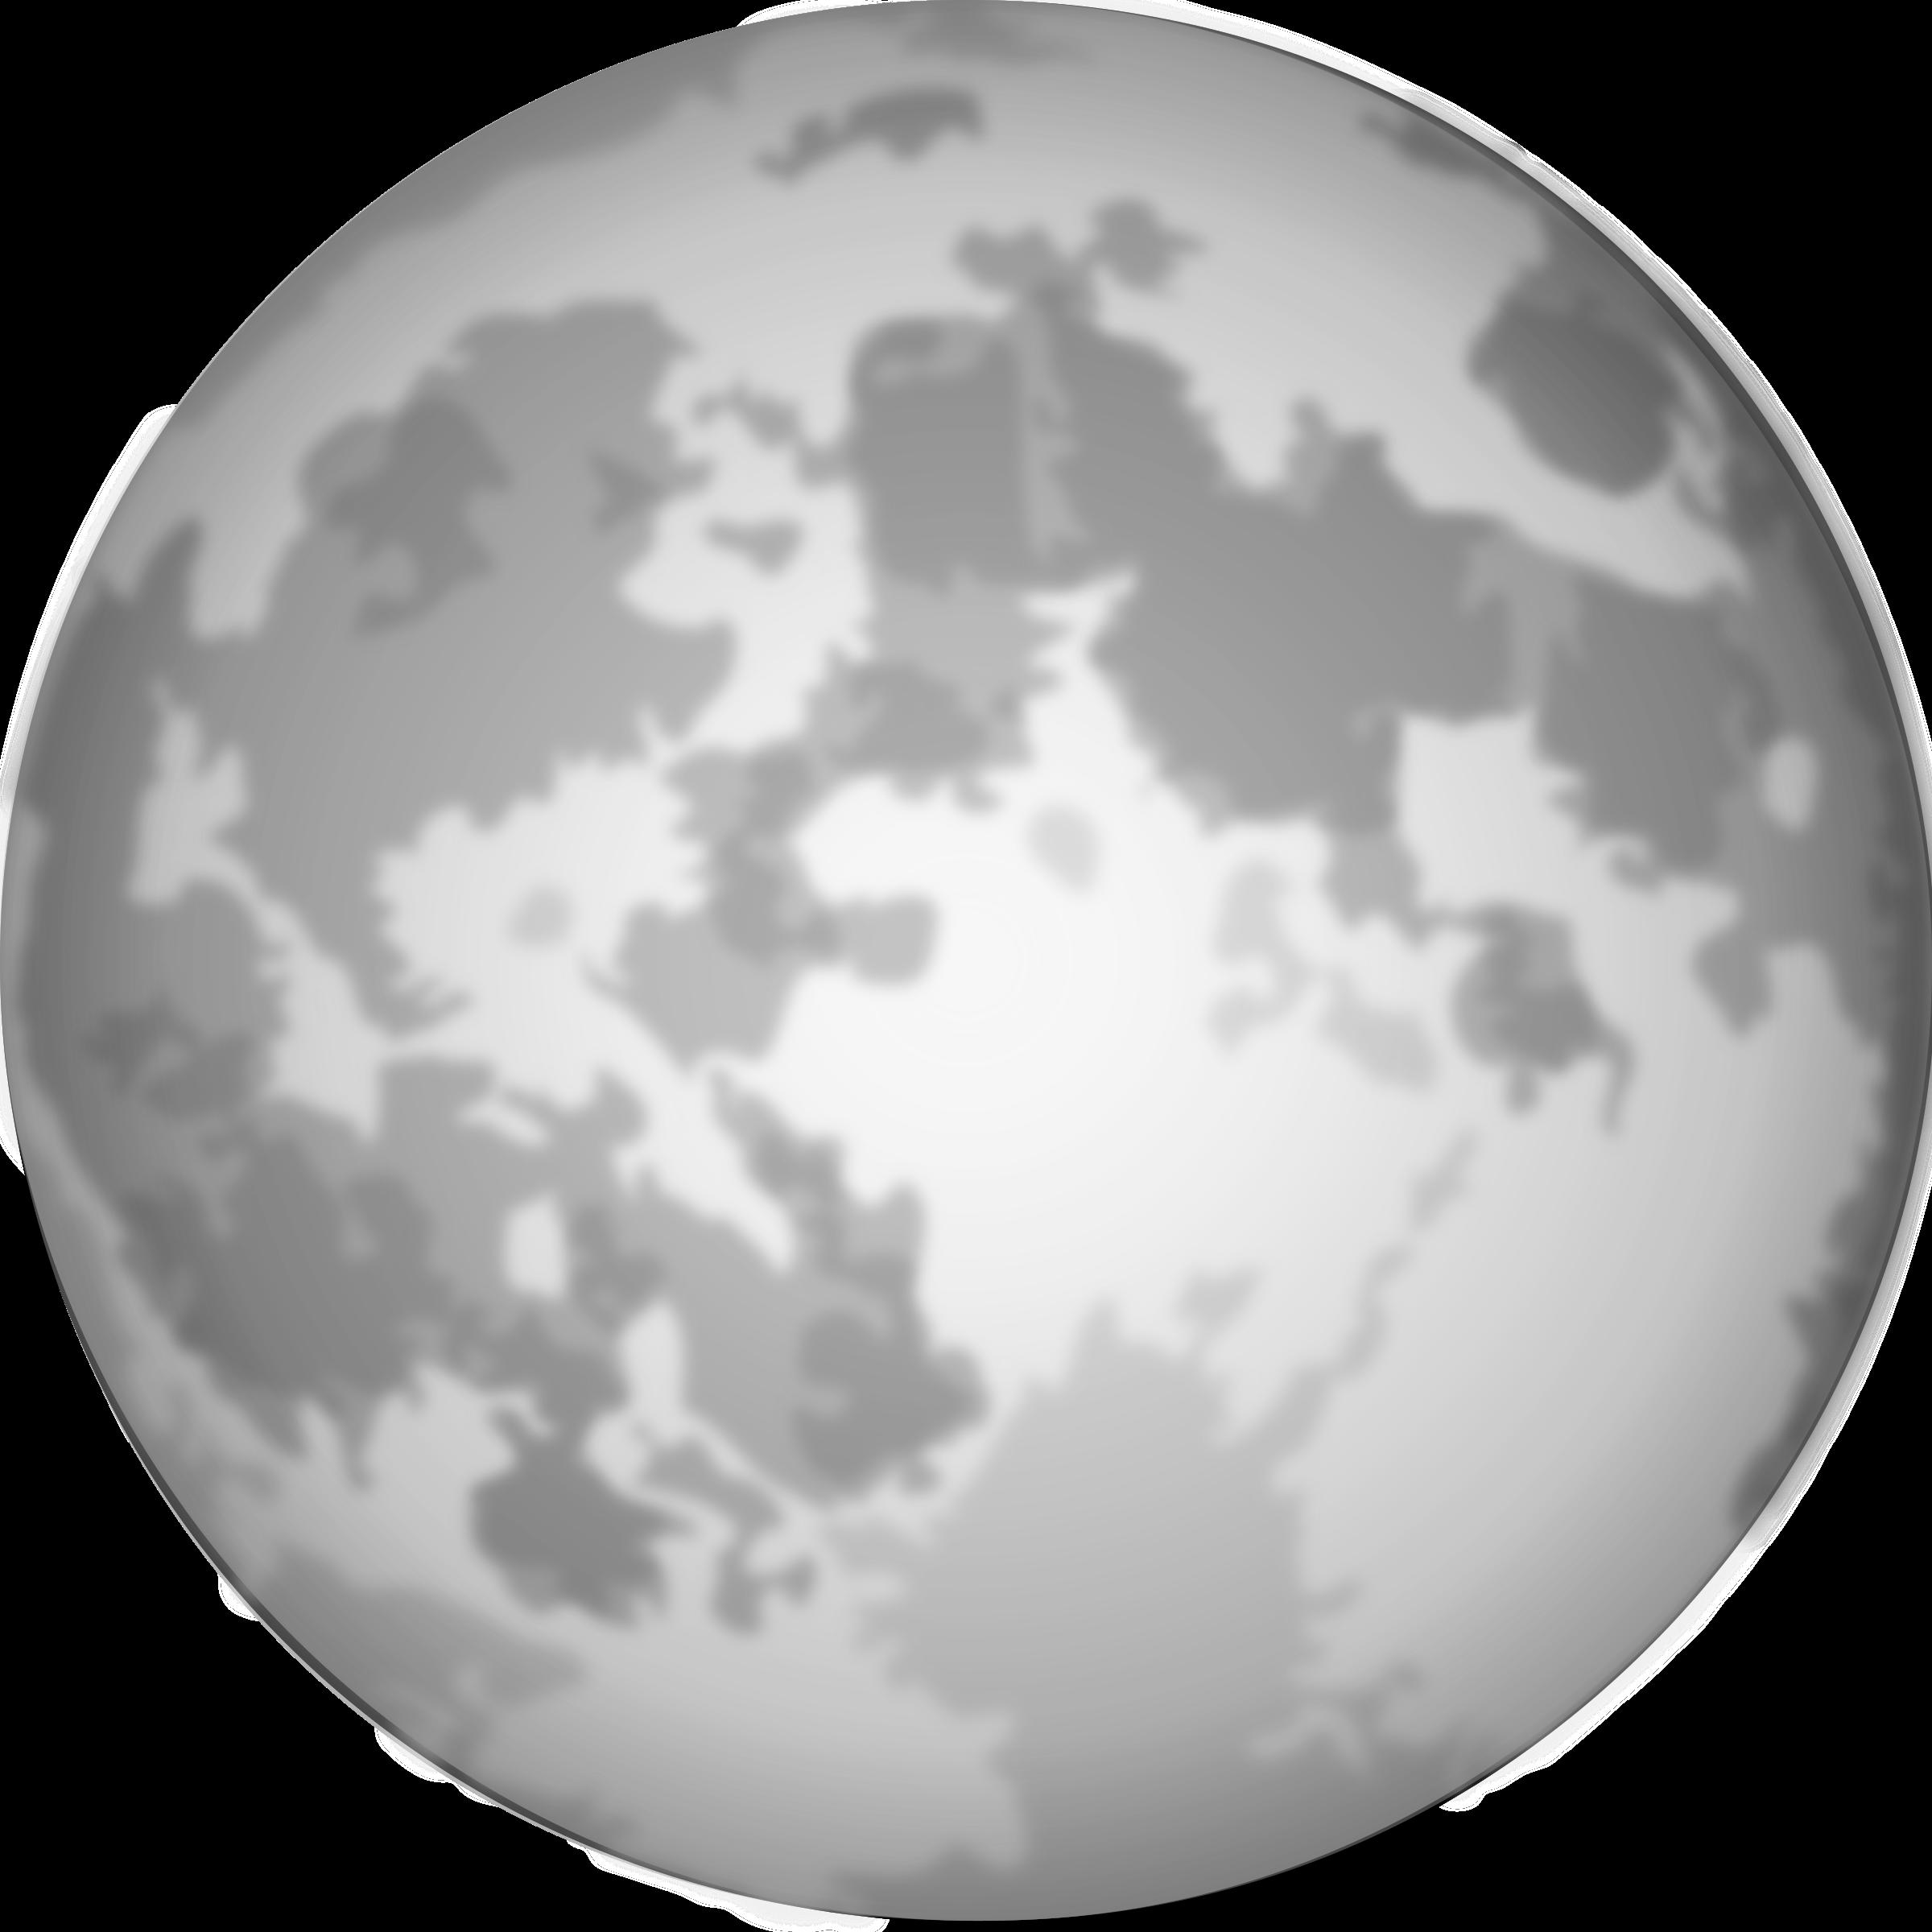 Moon PNG Image